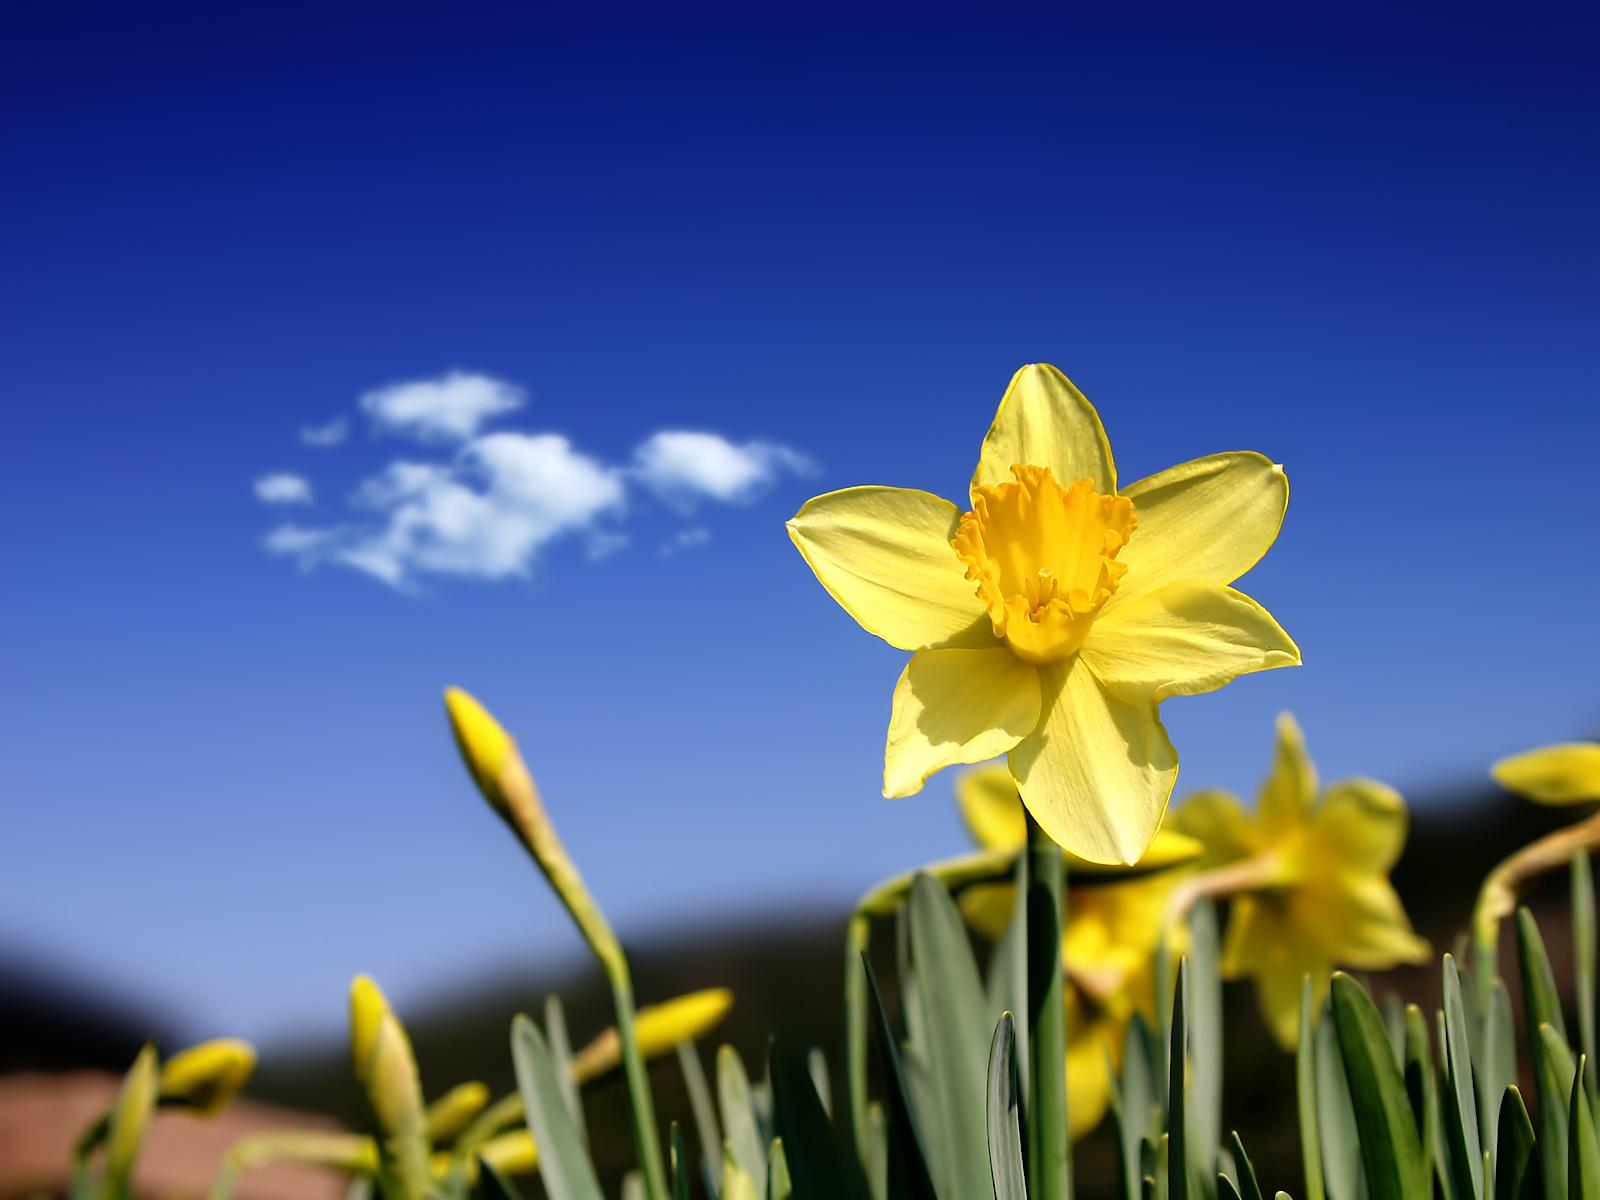 Daffodils - Poem by James McLain